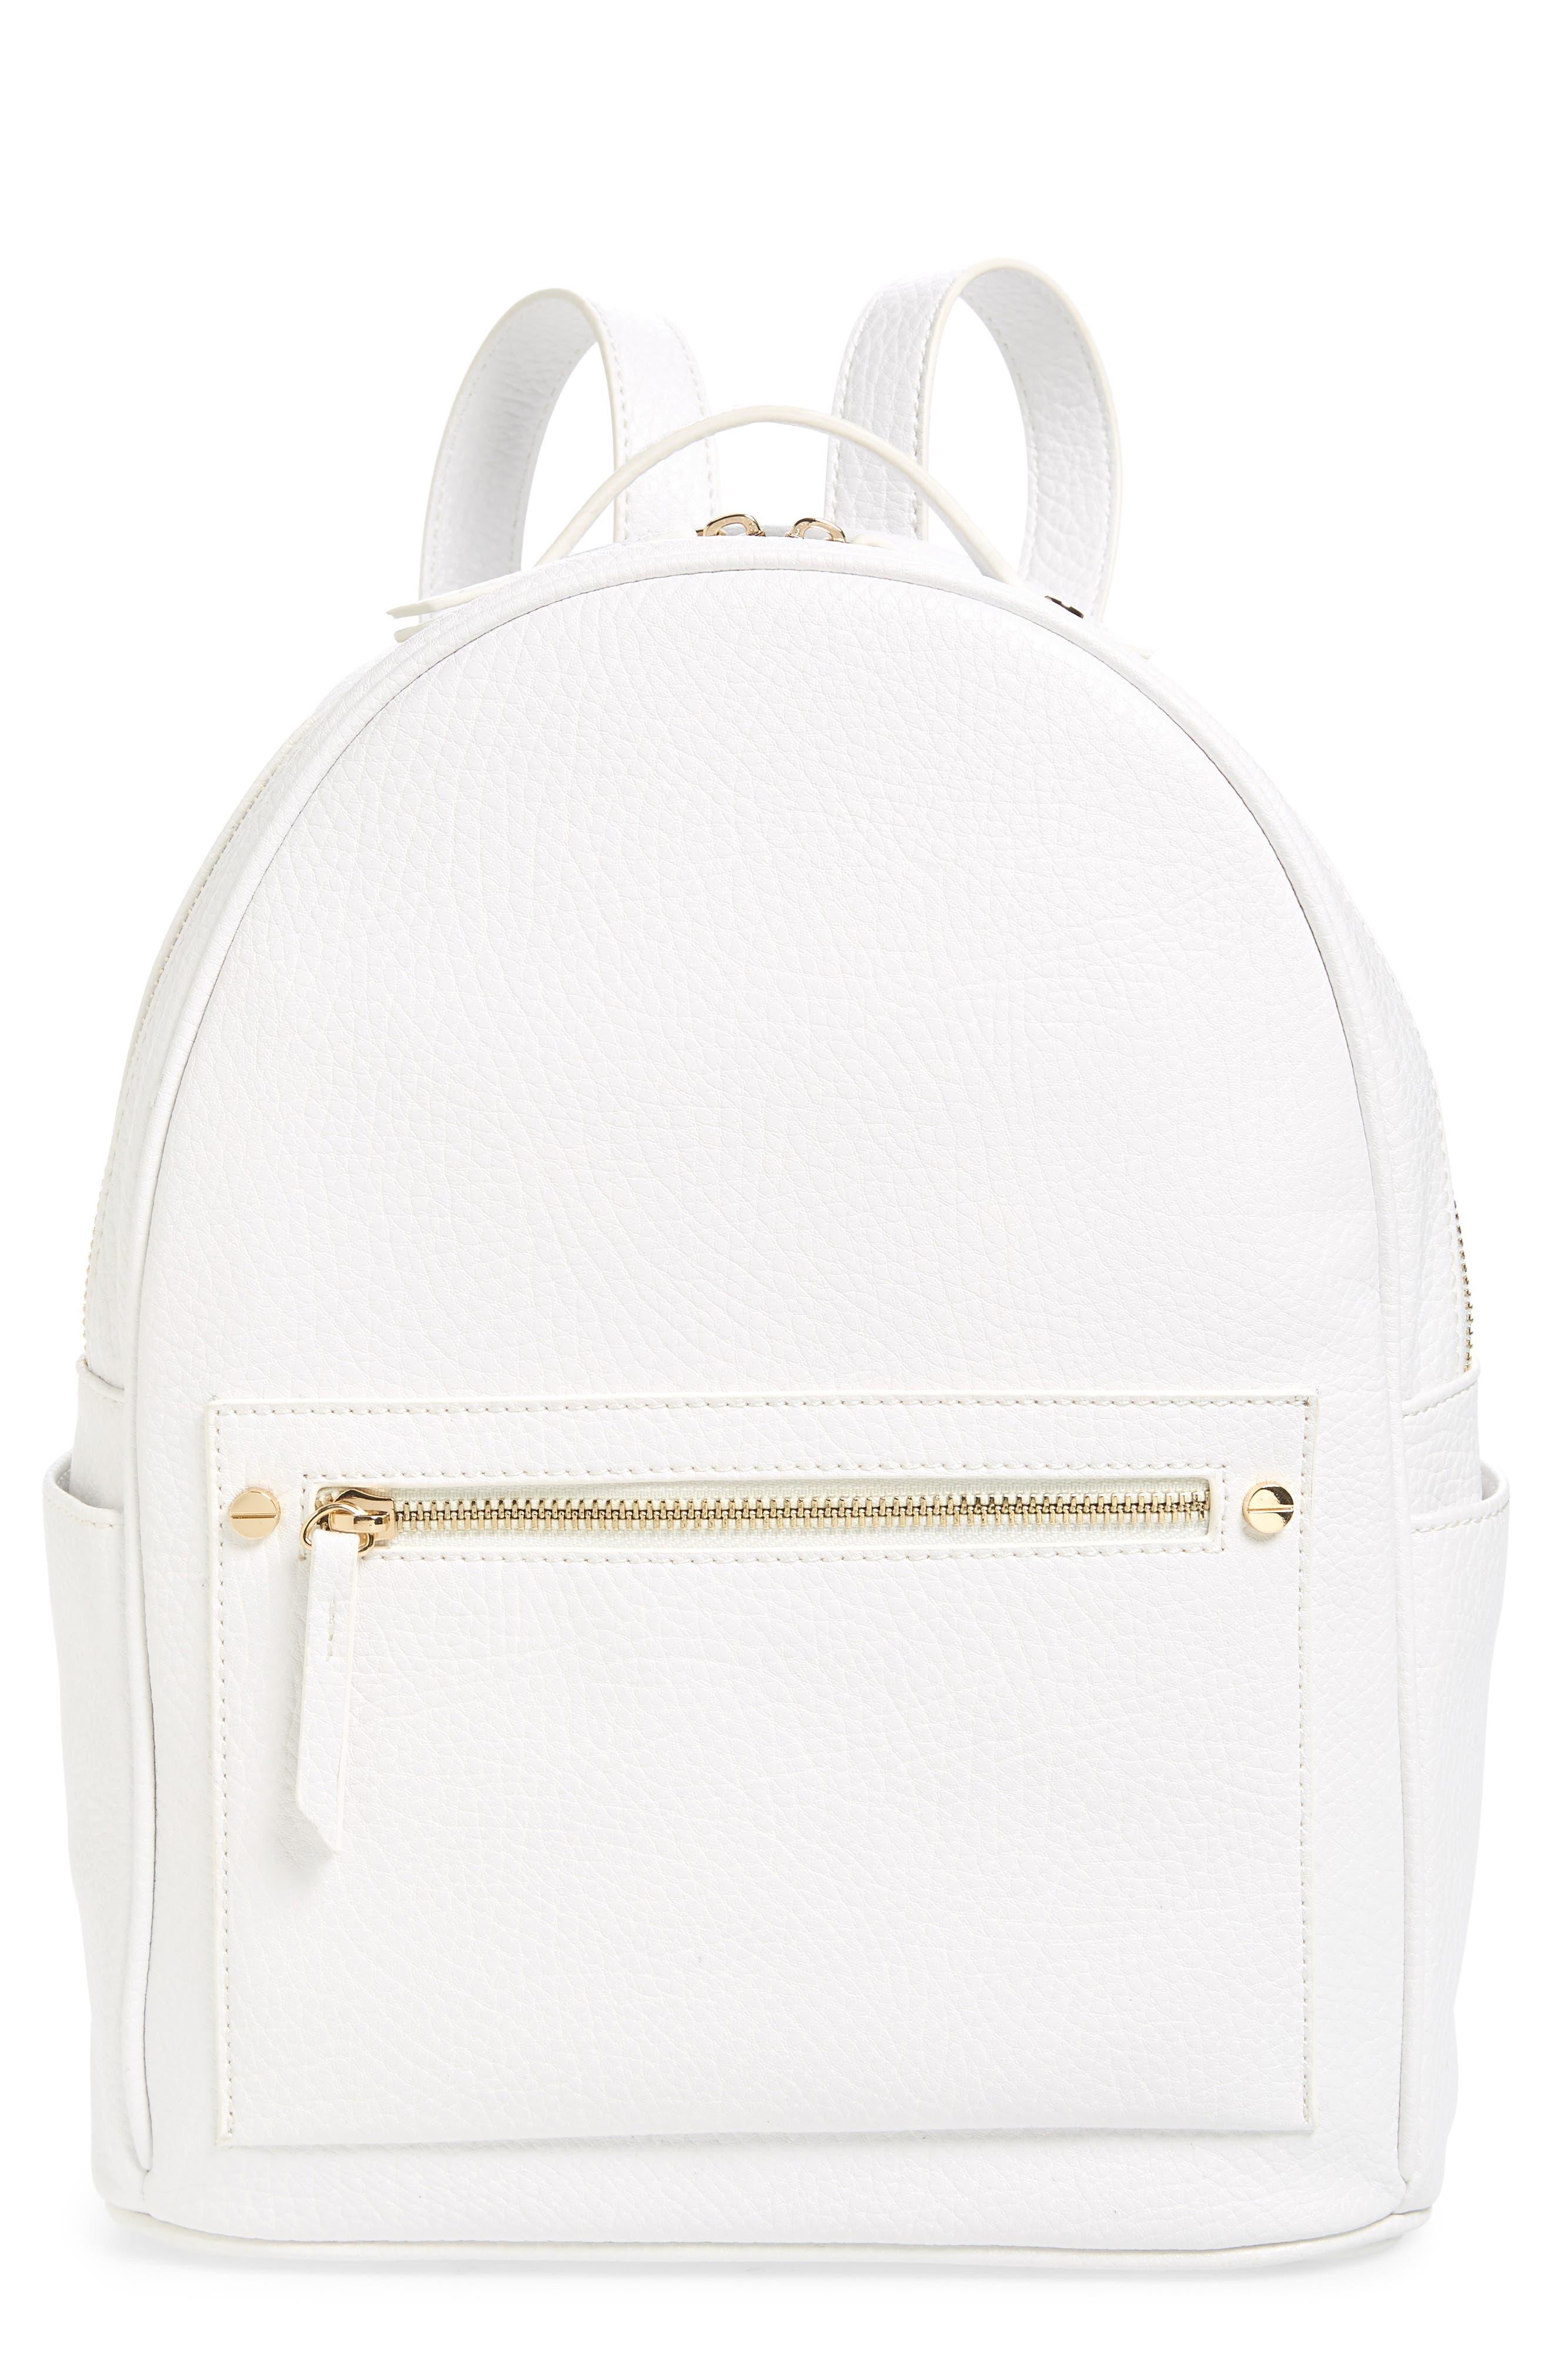 Mali + Lili Madison Vegan Leather Backpack,                             Main thumbnail 3, color,